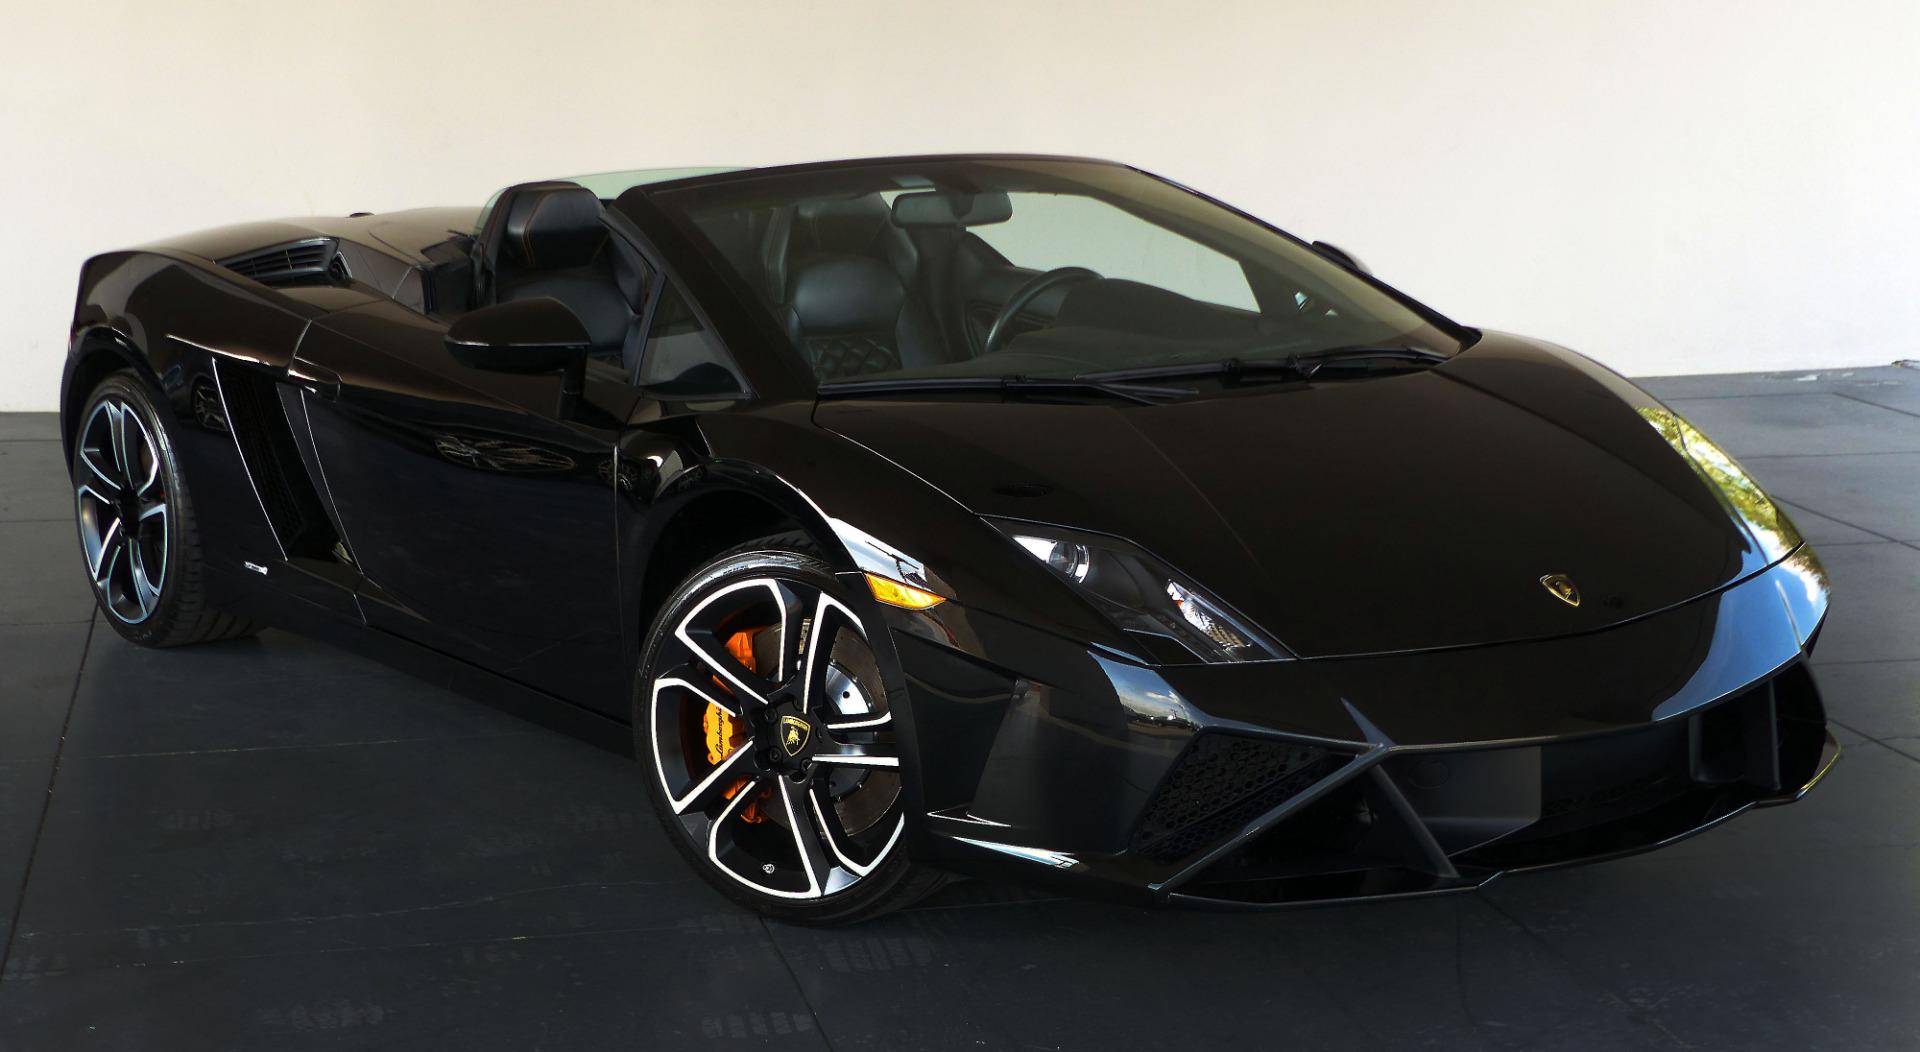 Used 2014 Lamborghini Gallardo Lp560 4 Marietta Ga